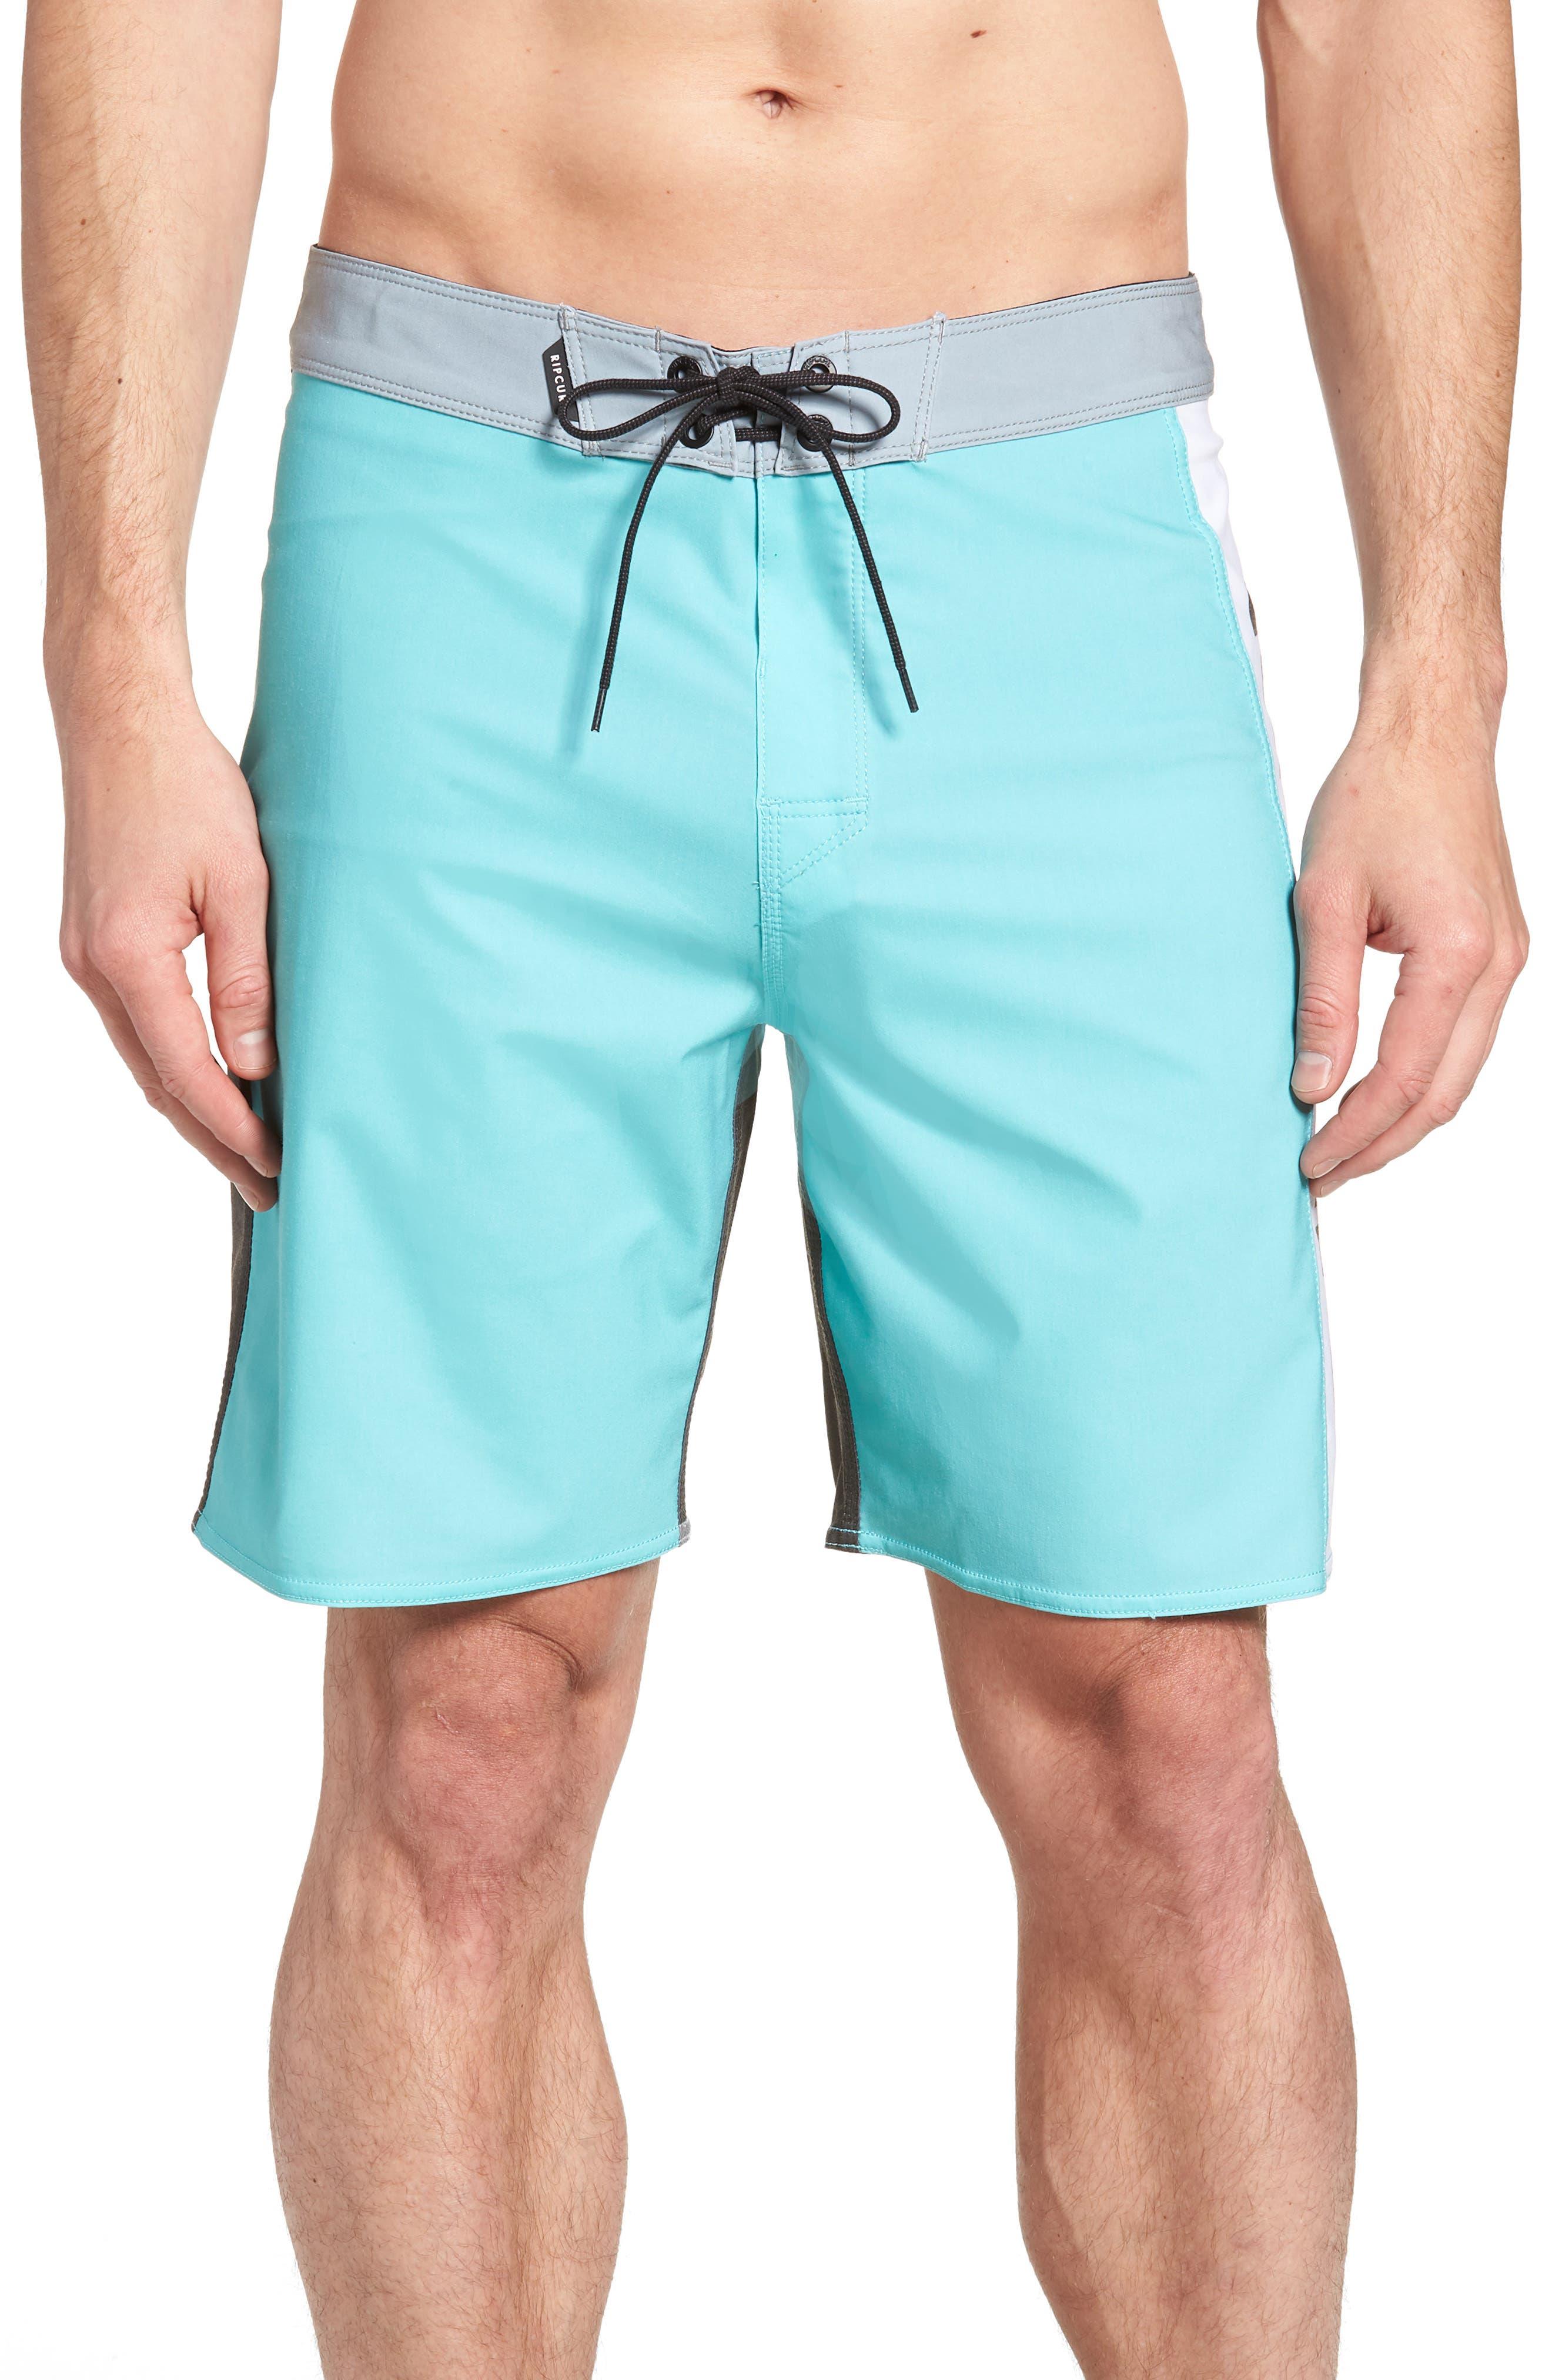 Mirage Owen Stretch Board Shorts,                             Main thumbnail 1, color,                             Aqua